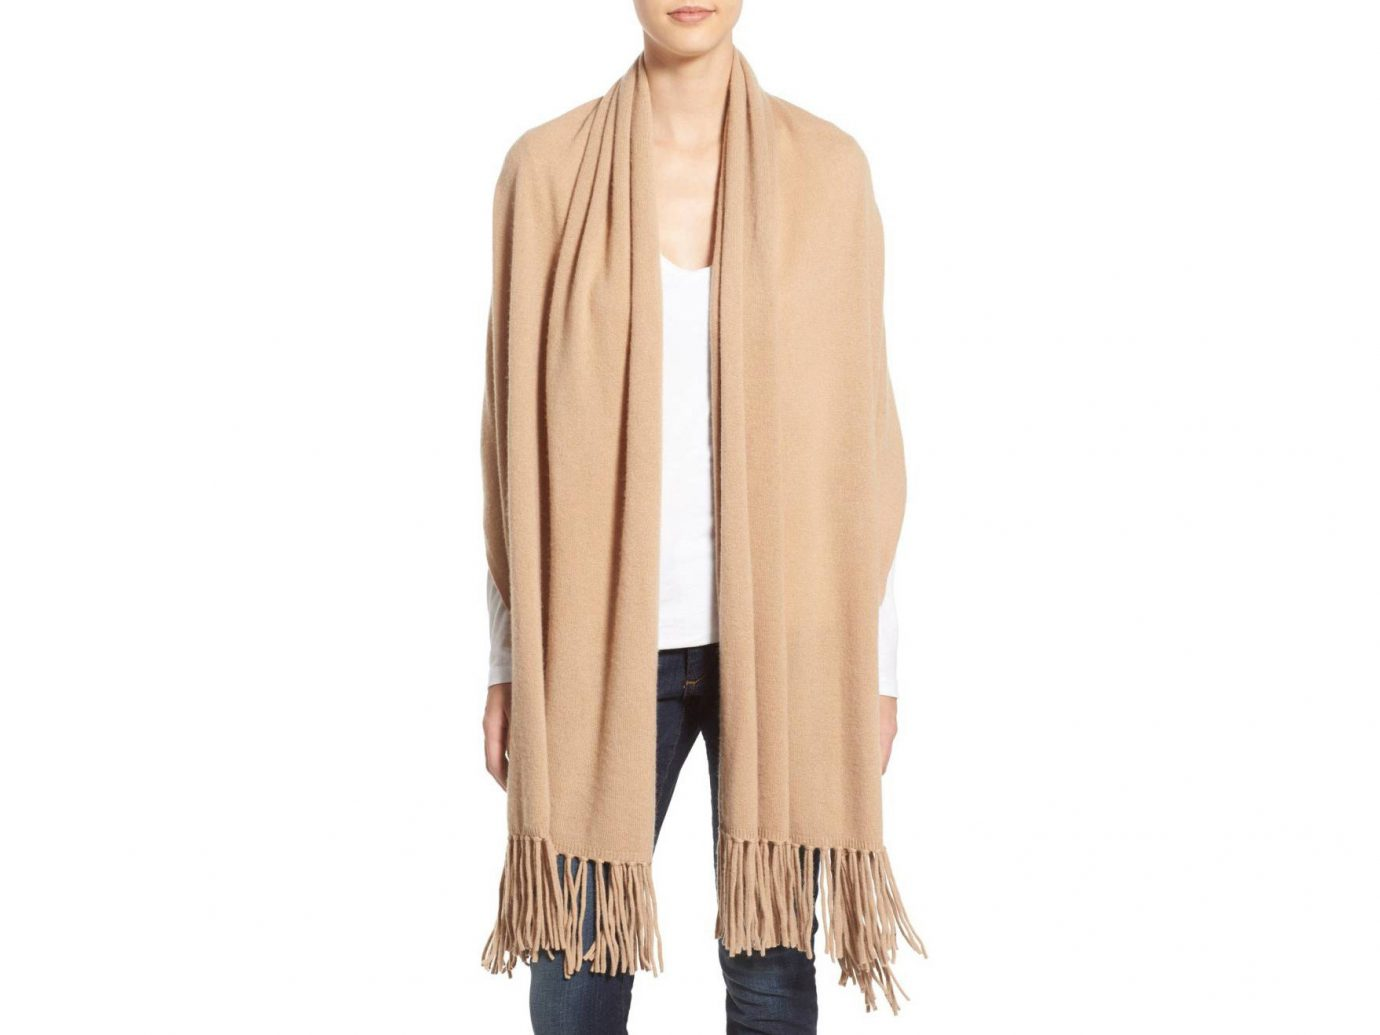 Packing Tips shopping Style + Design Travel Shop clothing stole shawl neck scarf